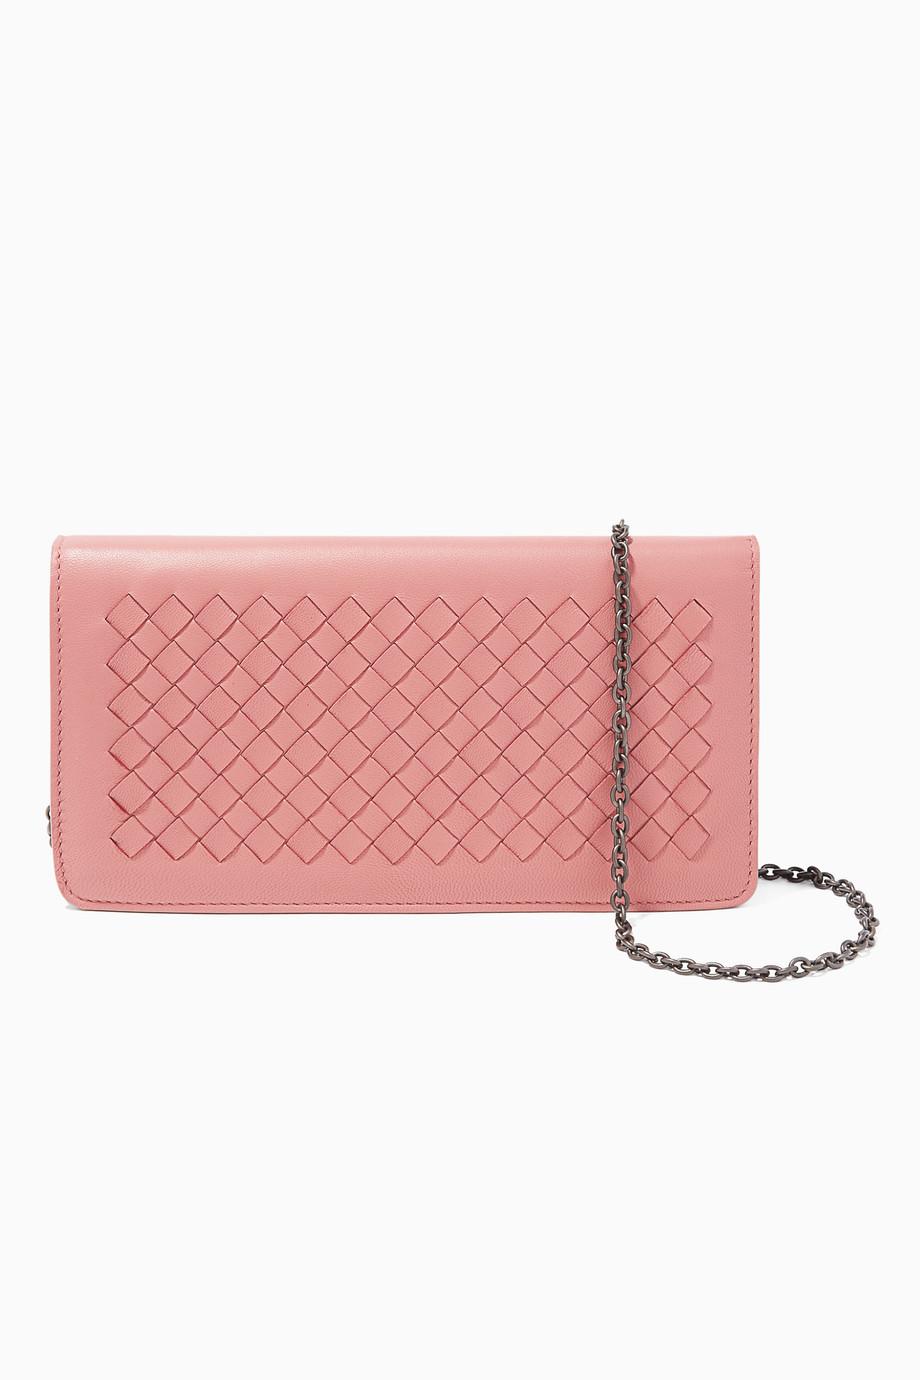 e9cb0aa36b5fb تسوق حقيبة محفظة ميني انترشياتو ذات اللون الوردي الباستيل الفاتح ...